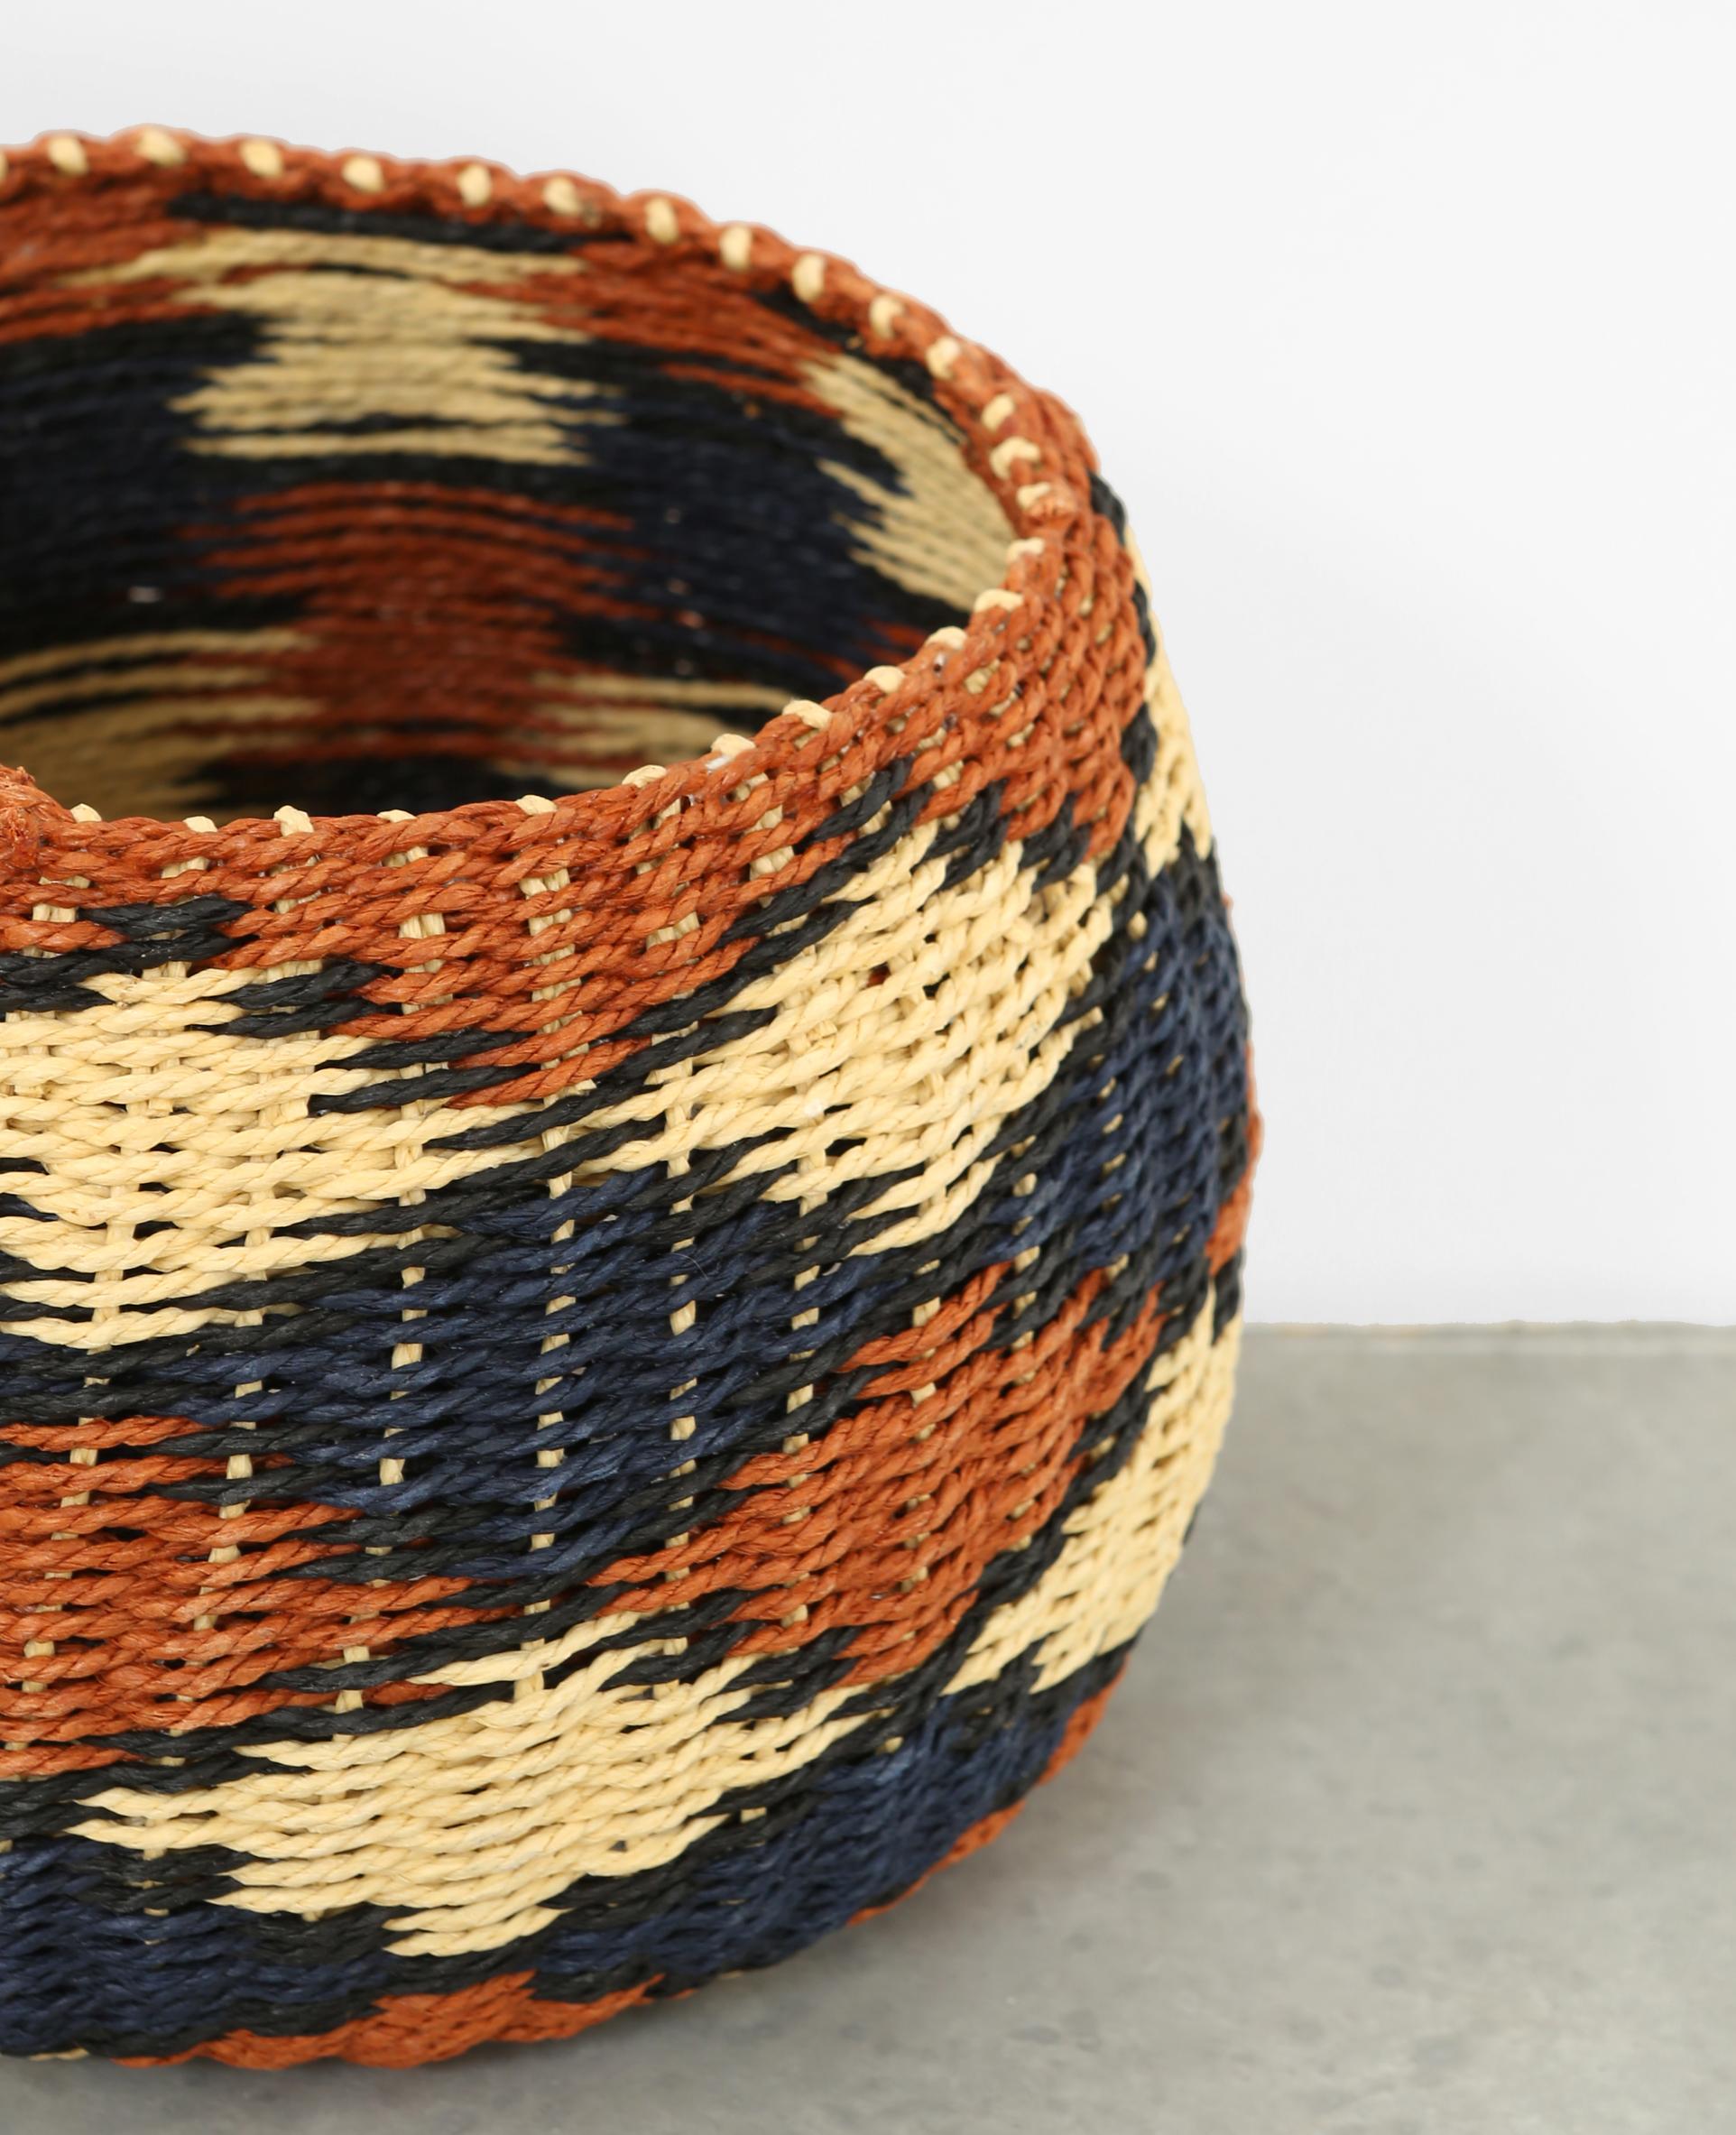 cache pot multicolore rouille 907061a10i81 pimkie. Black Bedroom Furniture Sets. Home Design Ideas